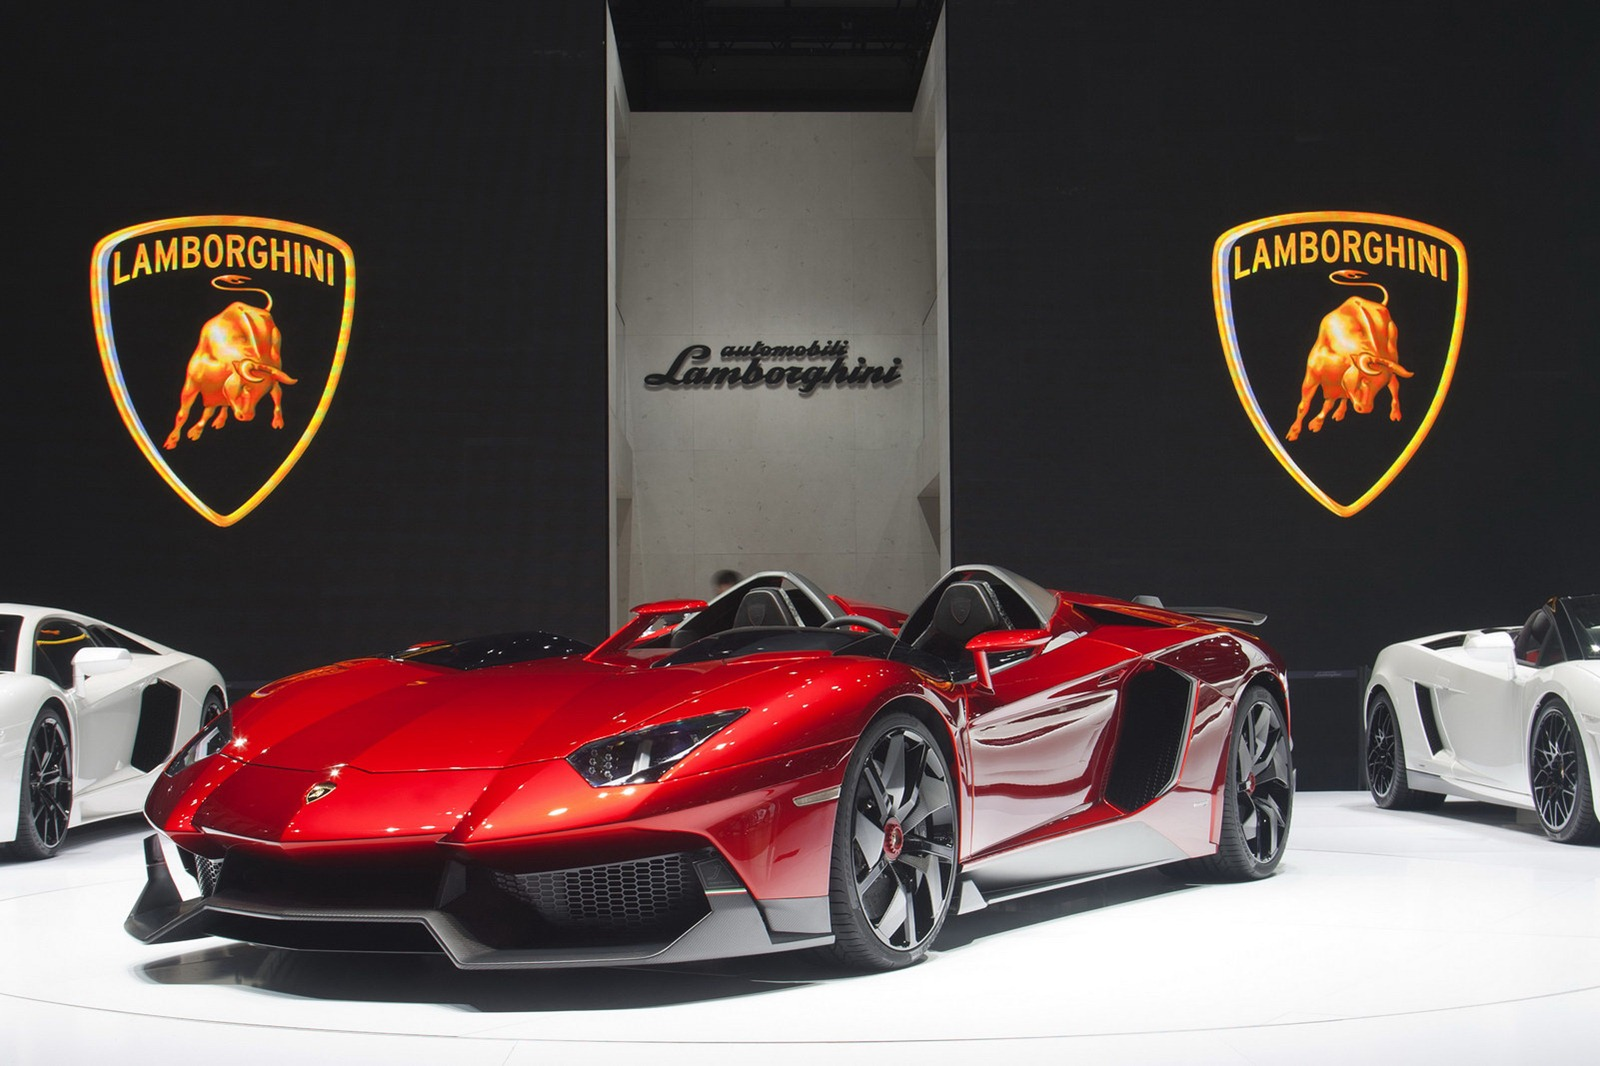 Nova Lamborghini Aventador j 2013 – Modelo, Vídeos, Fotos, Funções lamborghini aventador J speedster